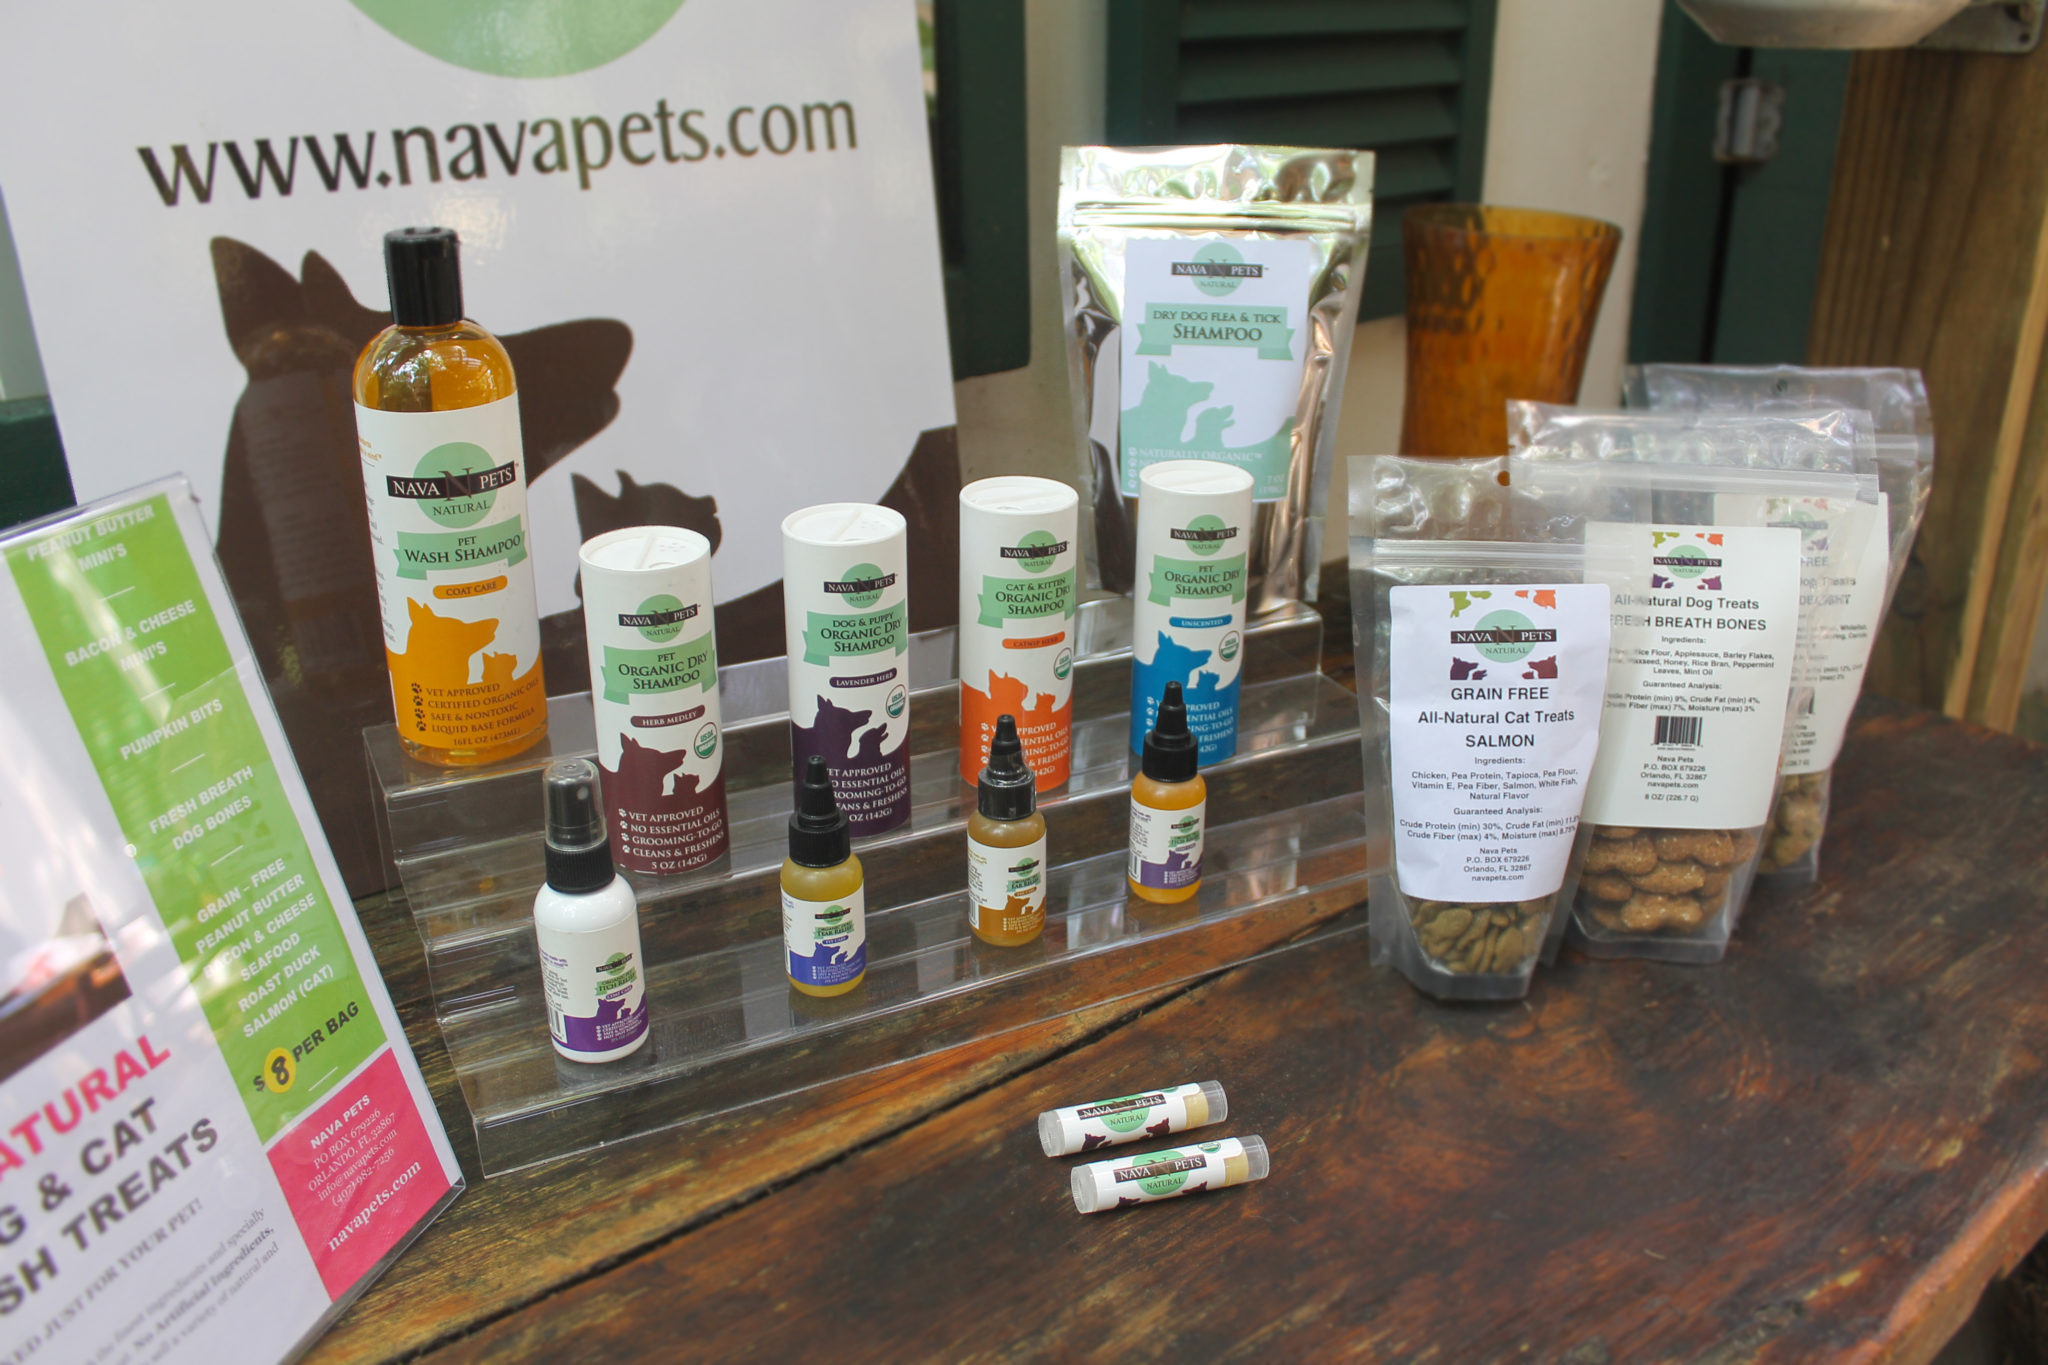 Organic pet care founder, Nava Pet products